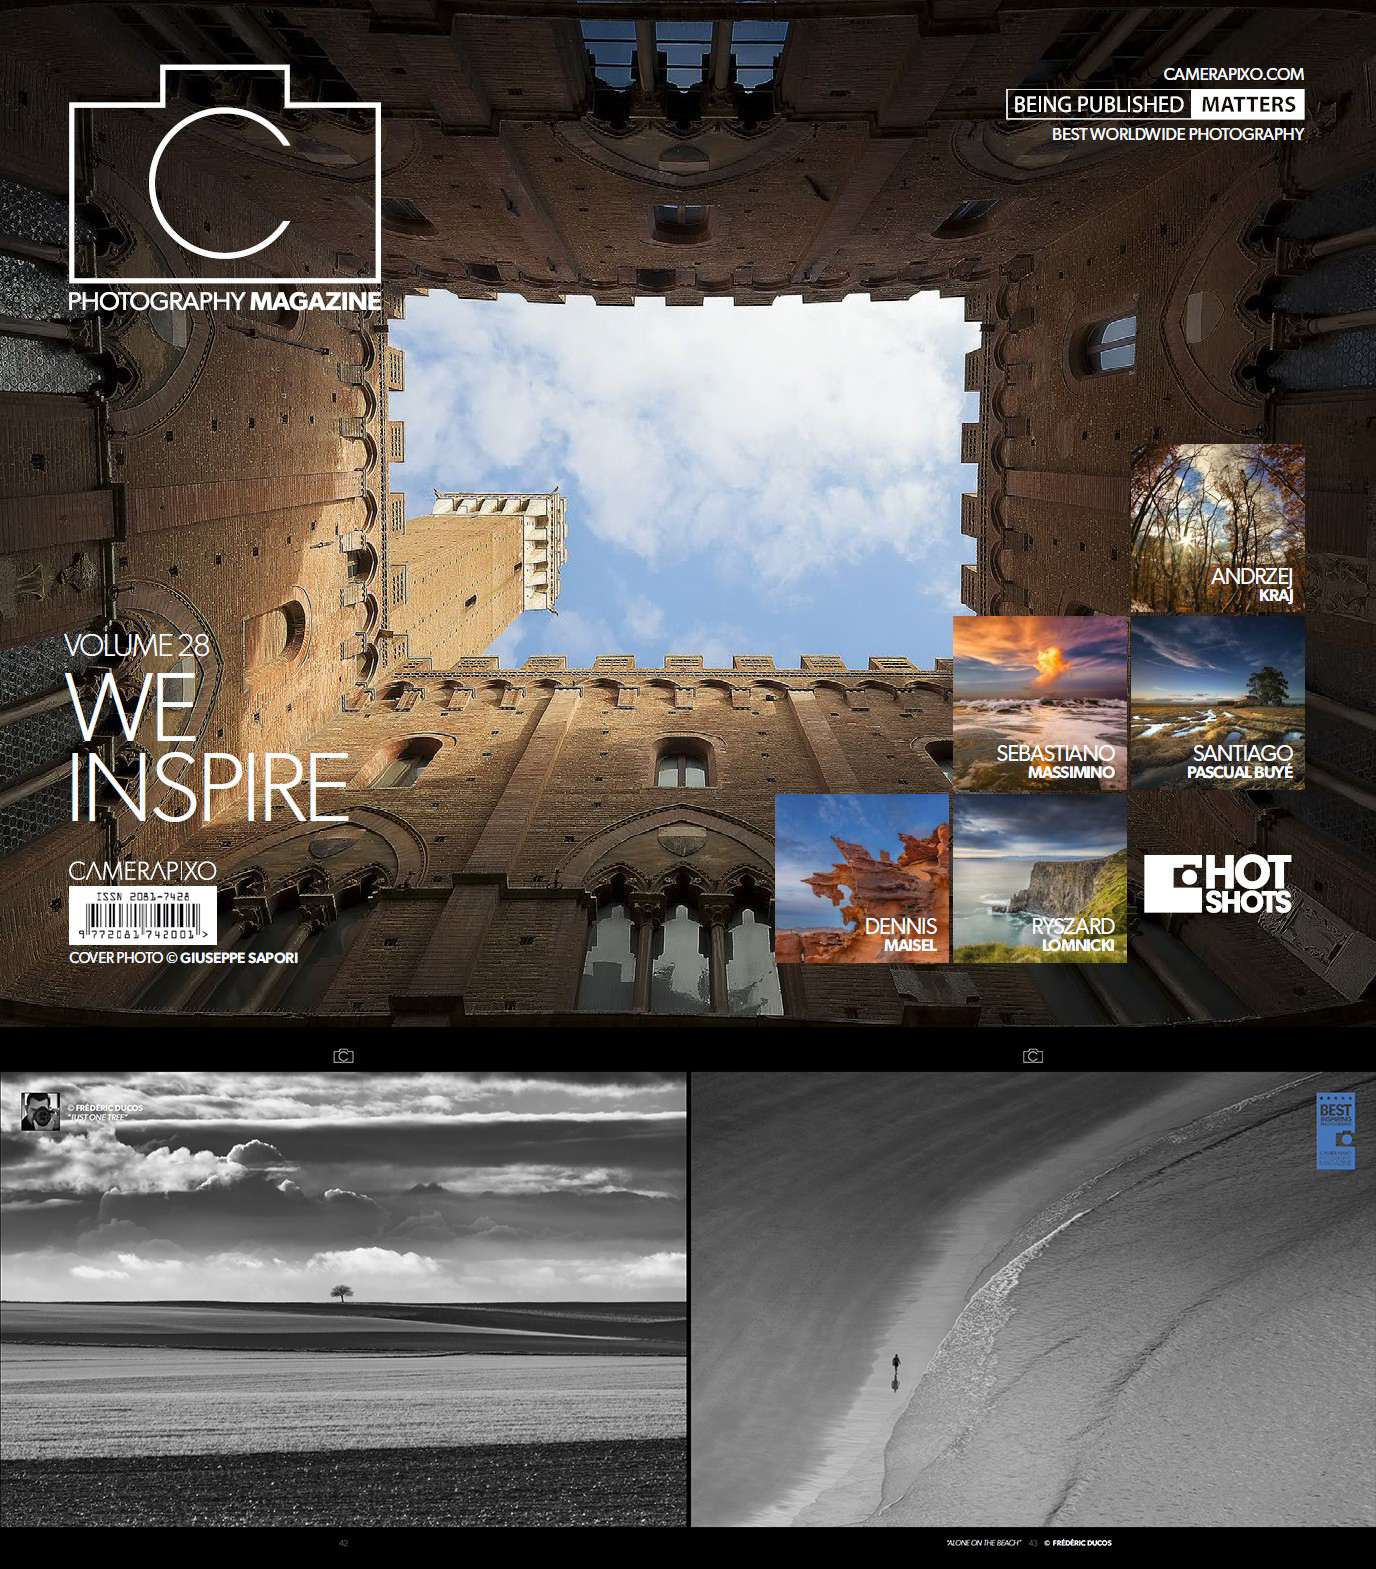 Camerapixo magazine N°28